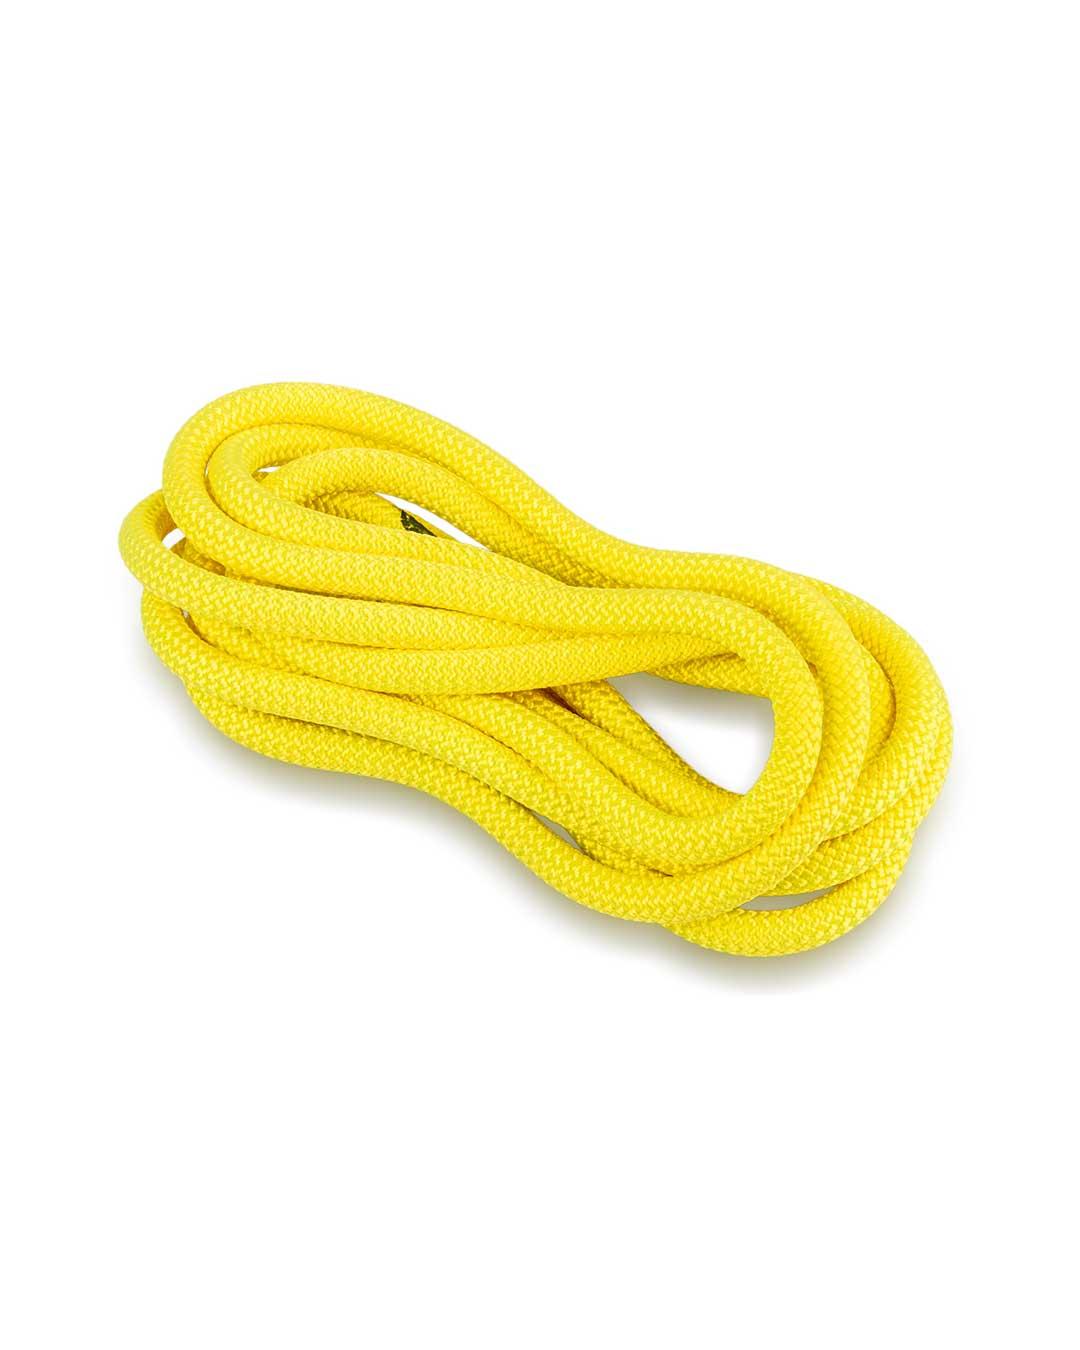 Cuerda de gimnasia rítmica Venturelli (Certificada FIG) amarillo neón- 3 m